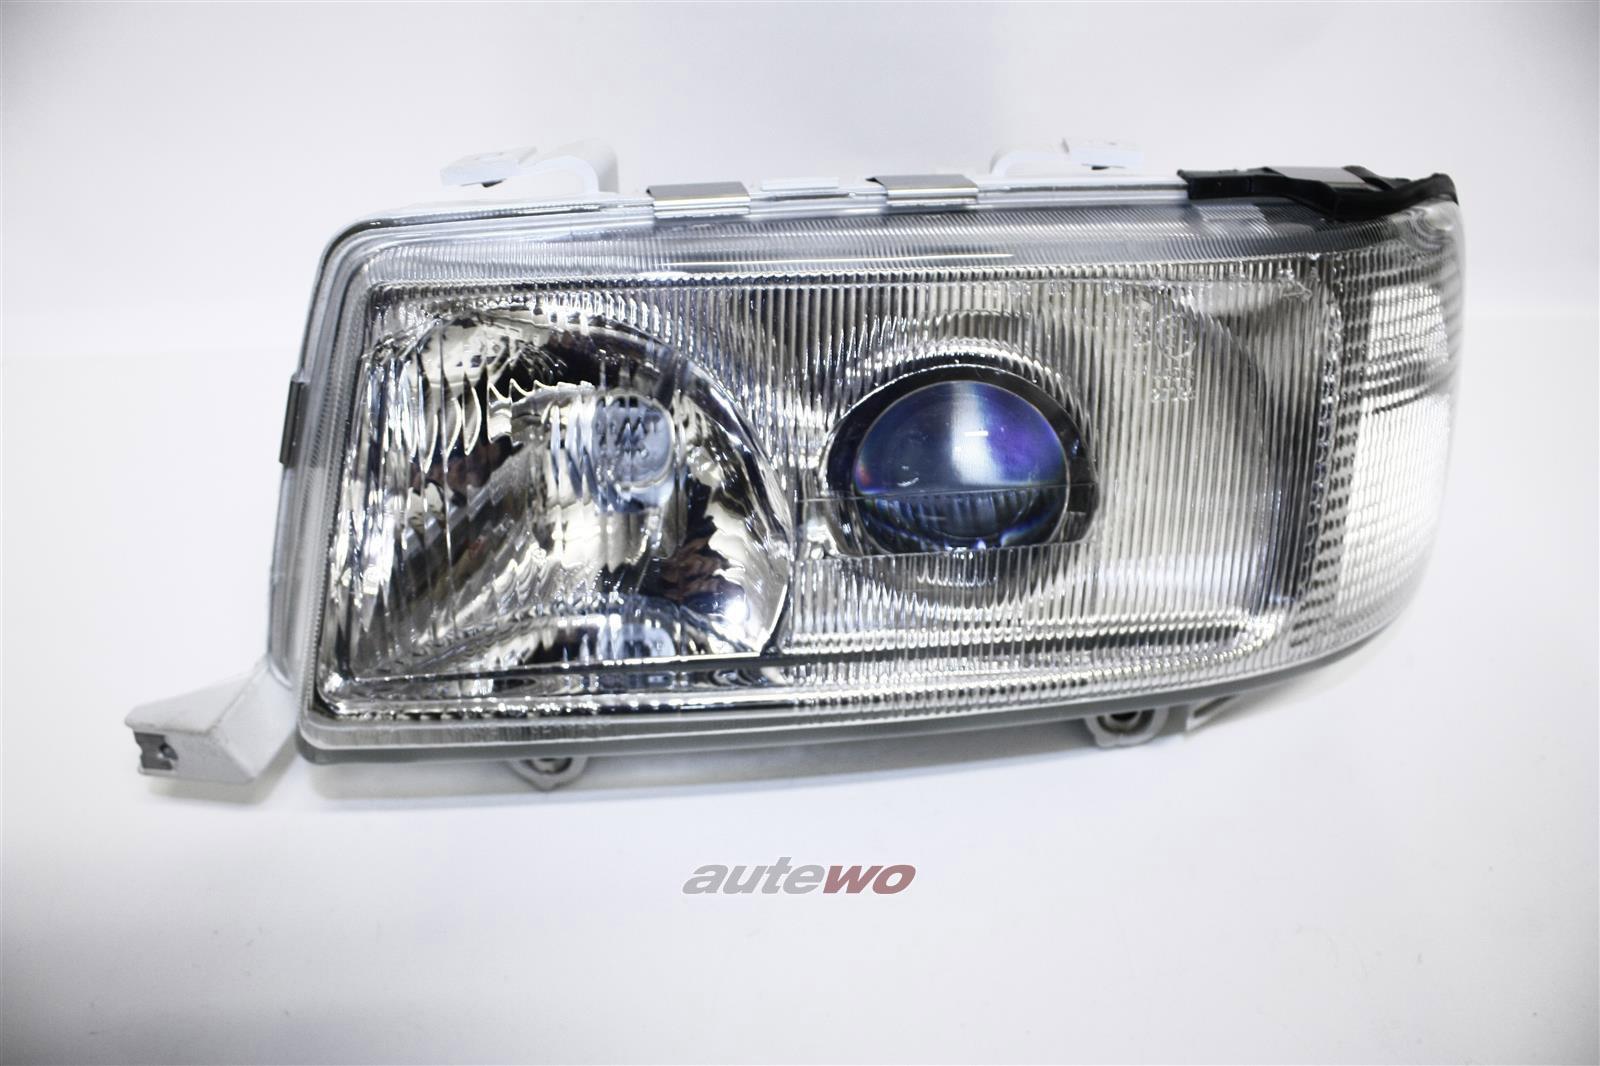 1AL007140-071 NEU Audi 80 B4/S2/RS2/Coupe/Cabrio DE-Scheinwerfer Links Hella